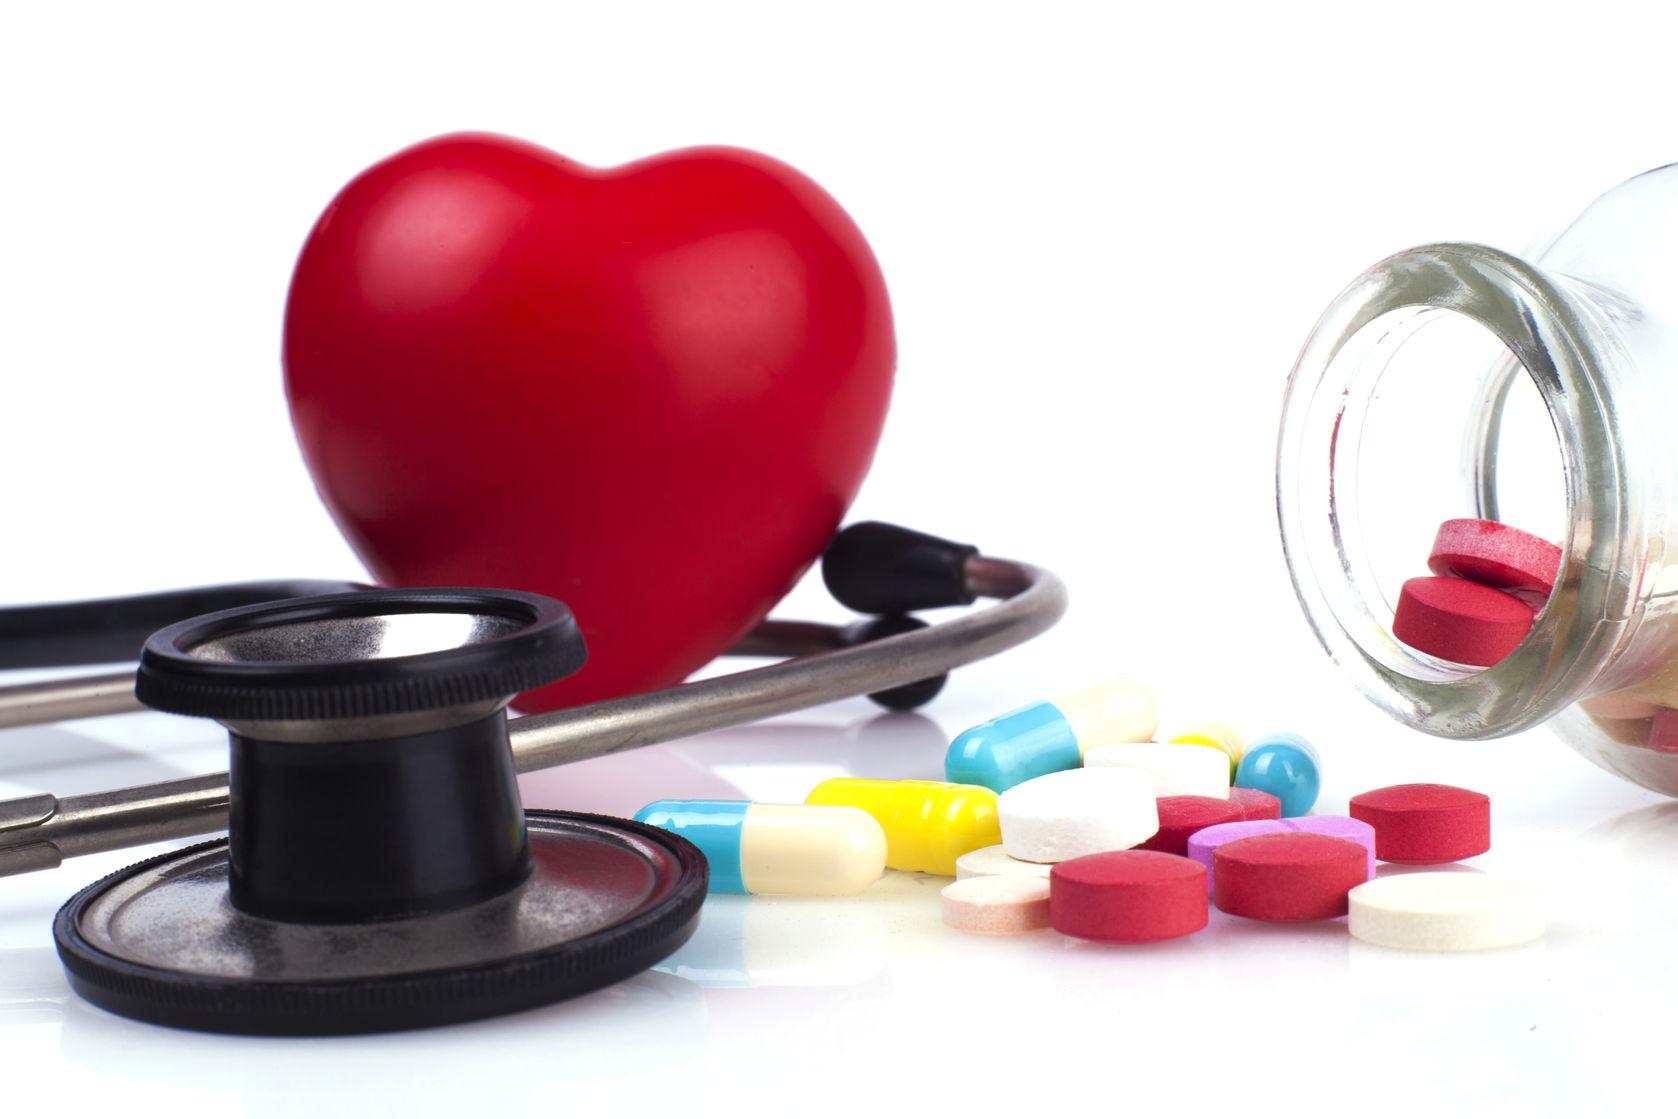 List Of High Blood Pressure Medications,  https://www.info-on-high-blood-pressure.com/listhighbloodpressuremedications.html